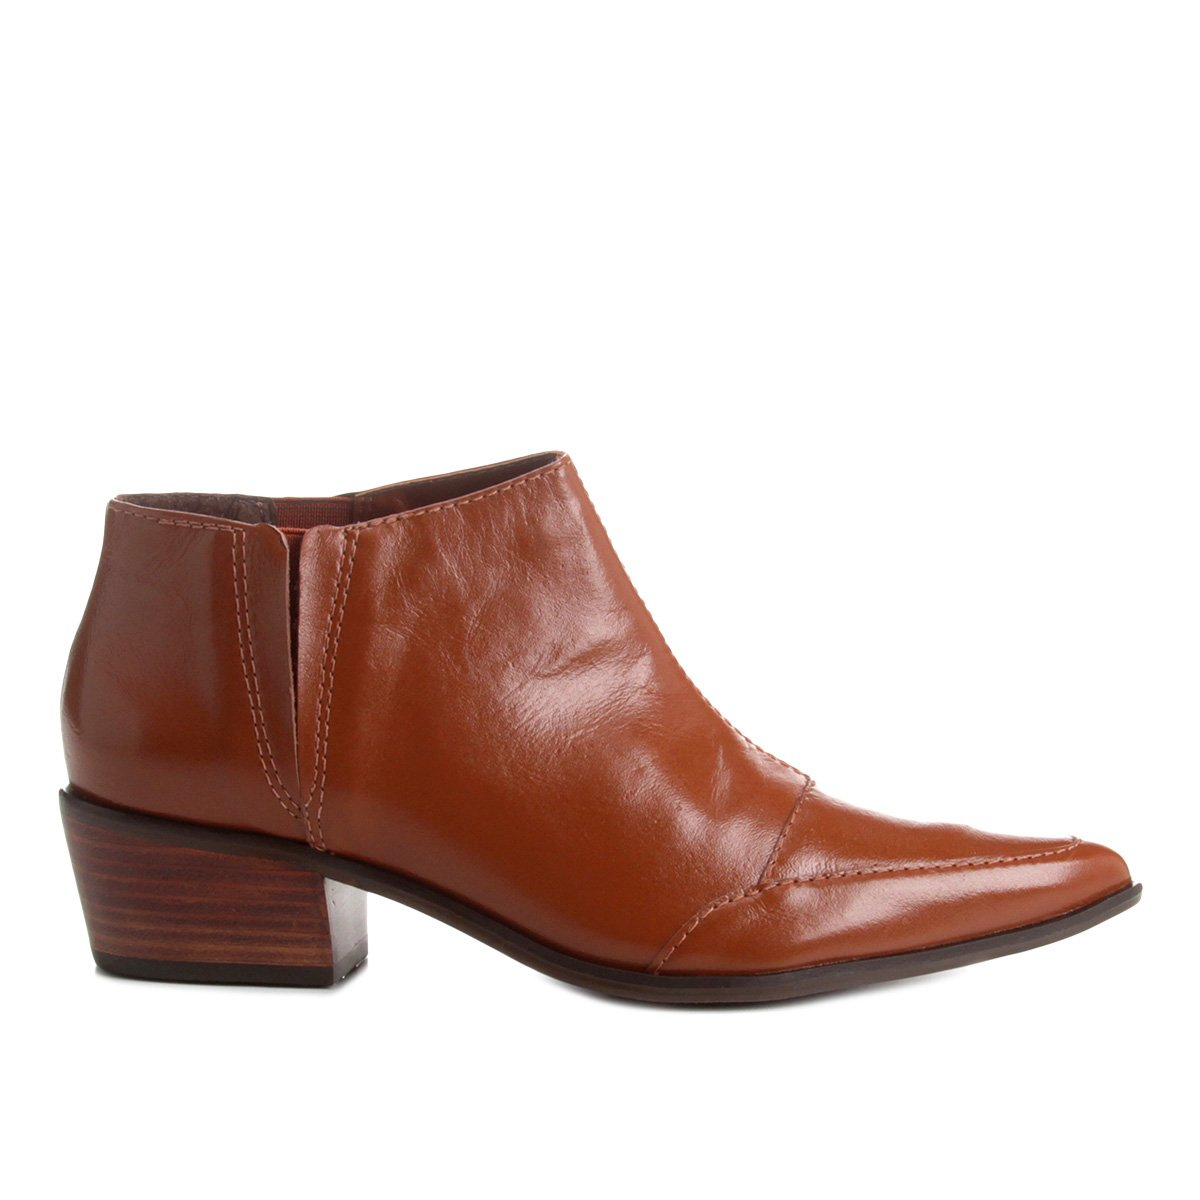 1b83ab0c33 Bico Couro Curto Agora Cano Feminina Fino Compre Shoestock Bota wTPIxAqw